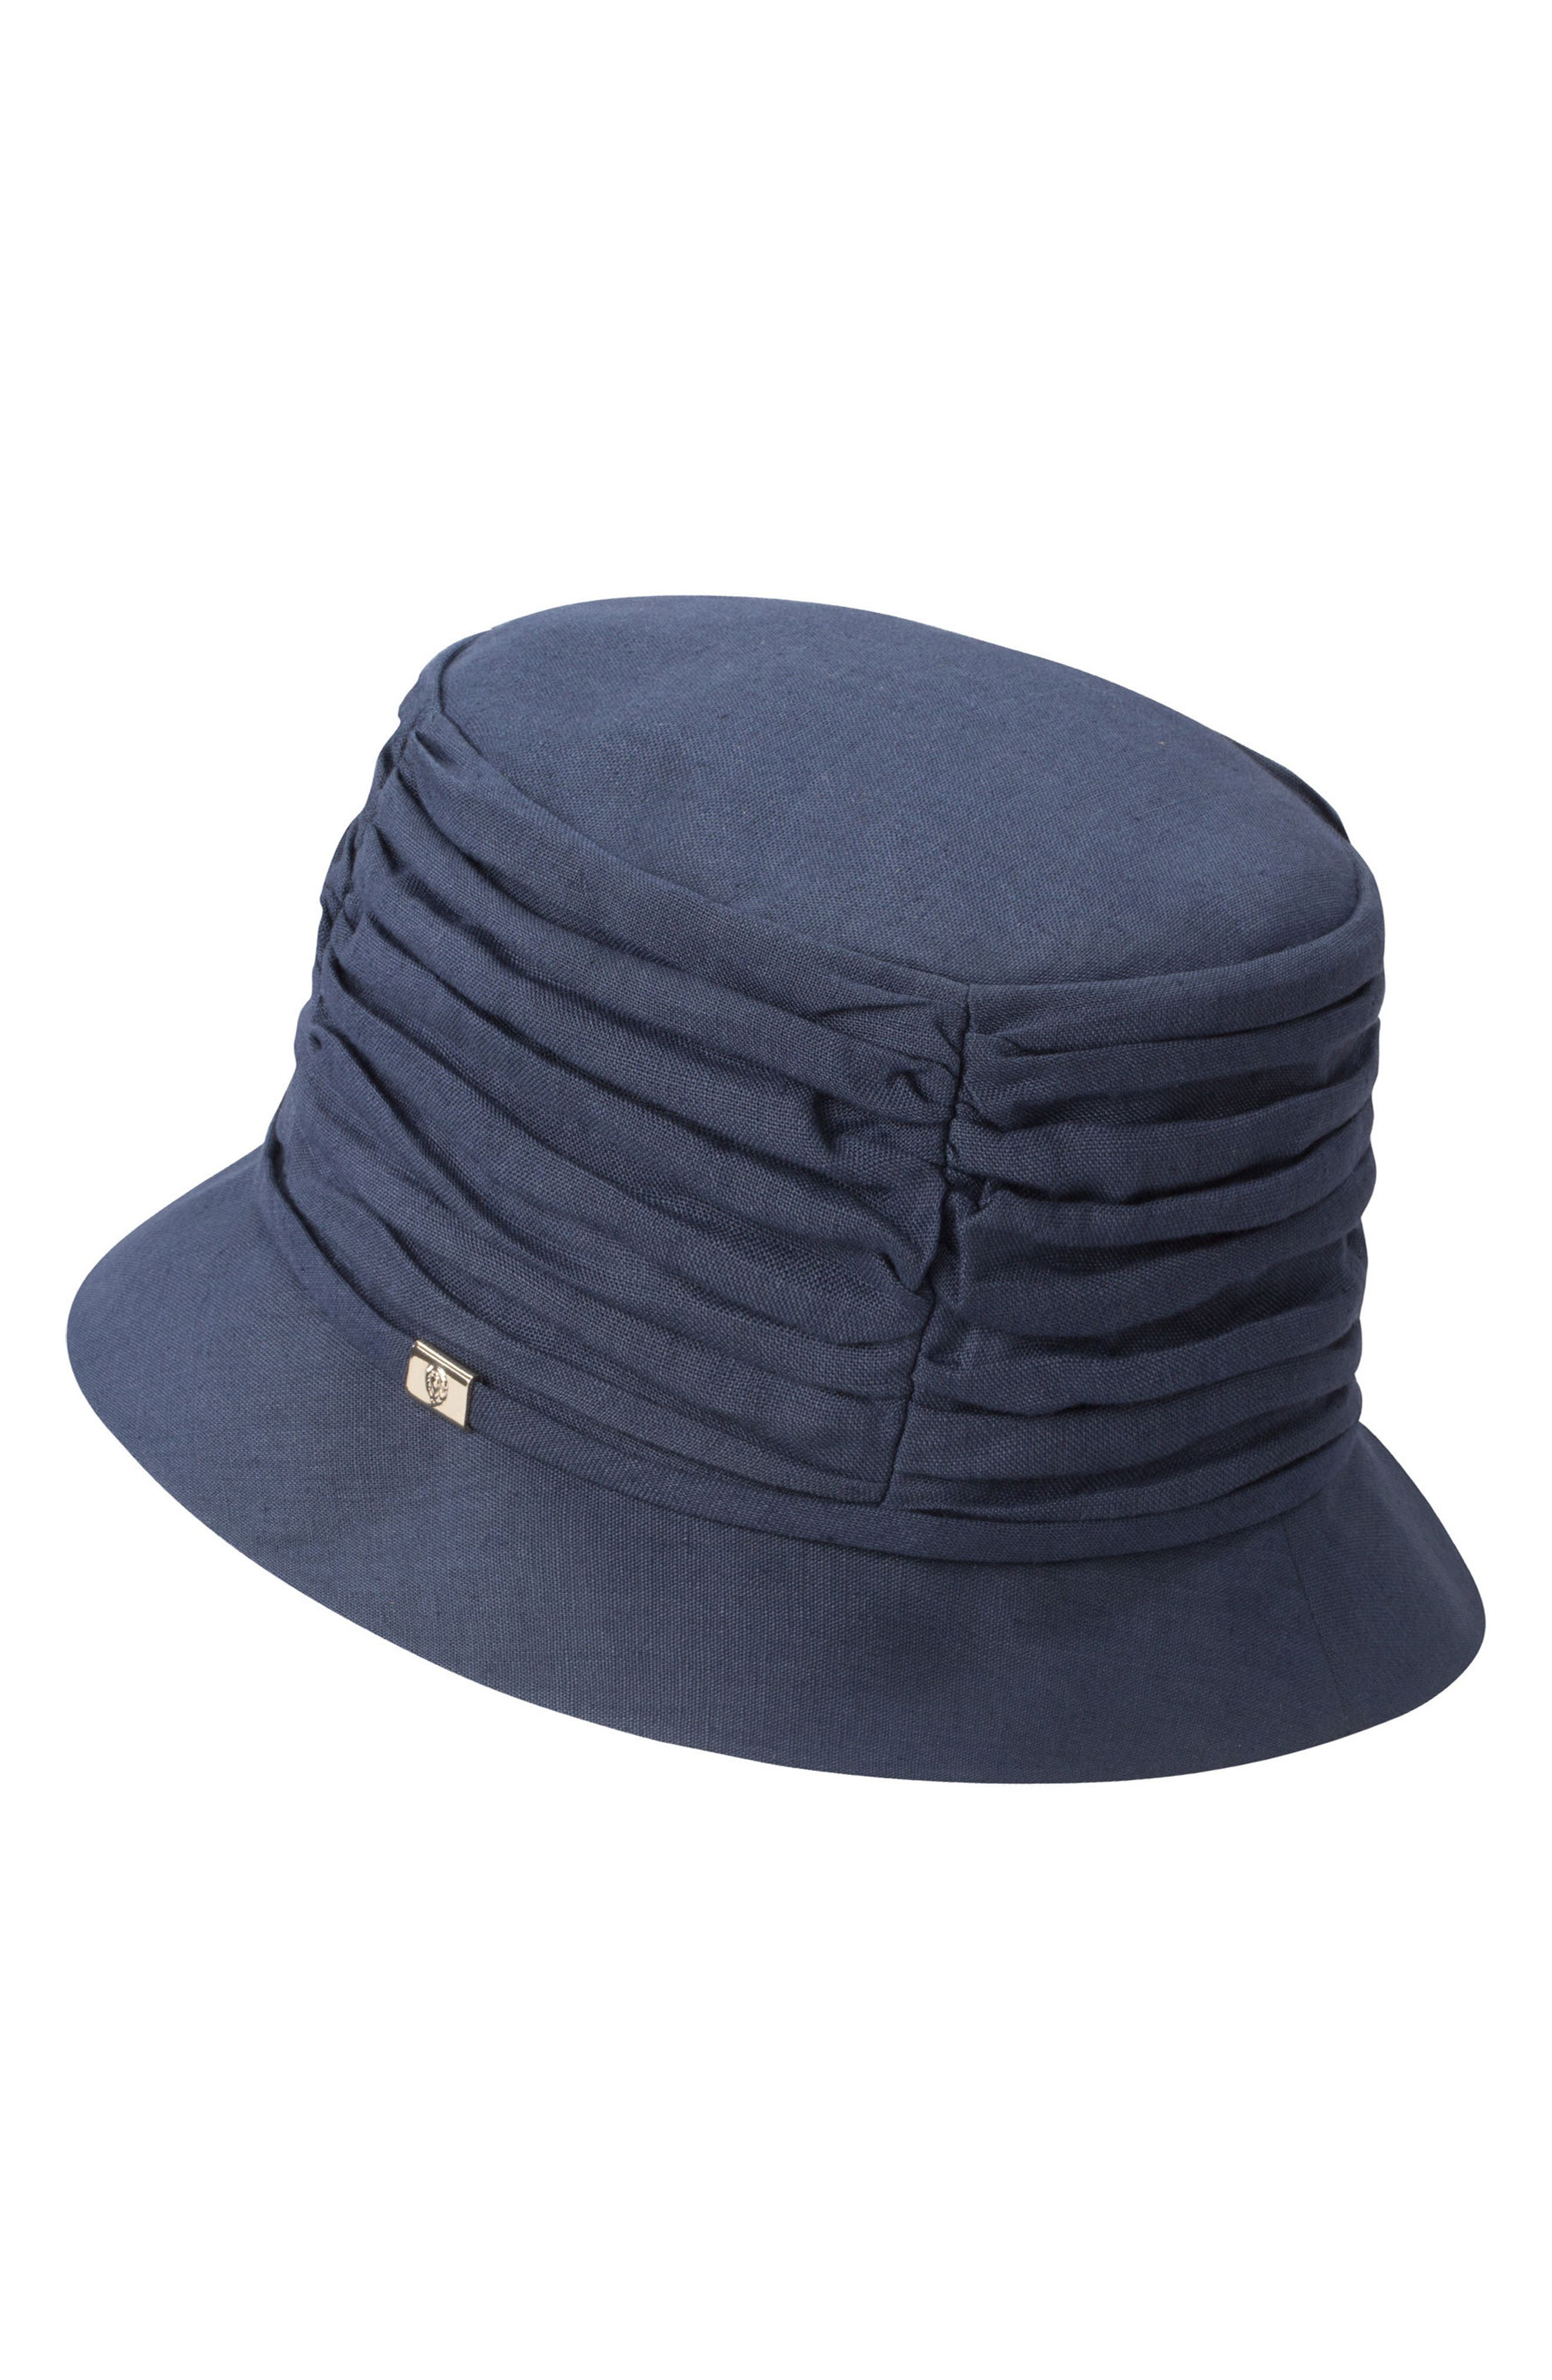 HELEN KAMINSKI CLASSIC LINEN BUCKET HAT - BLUE